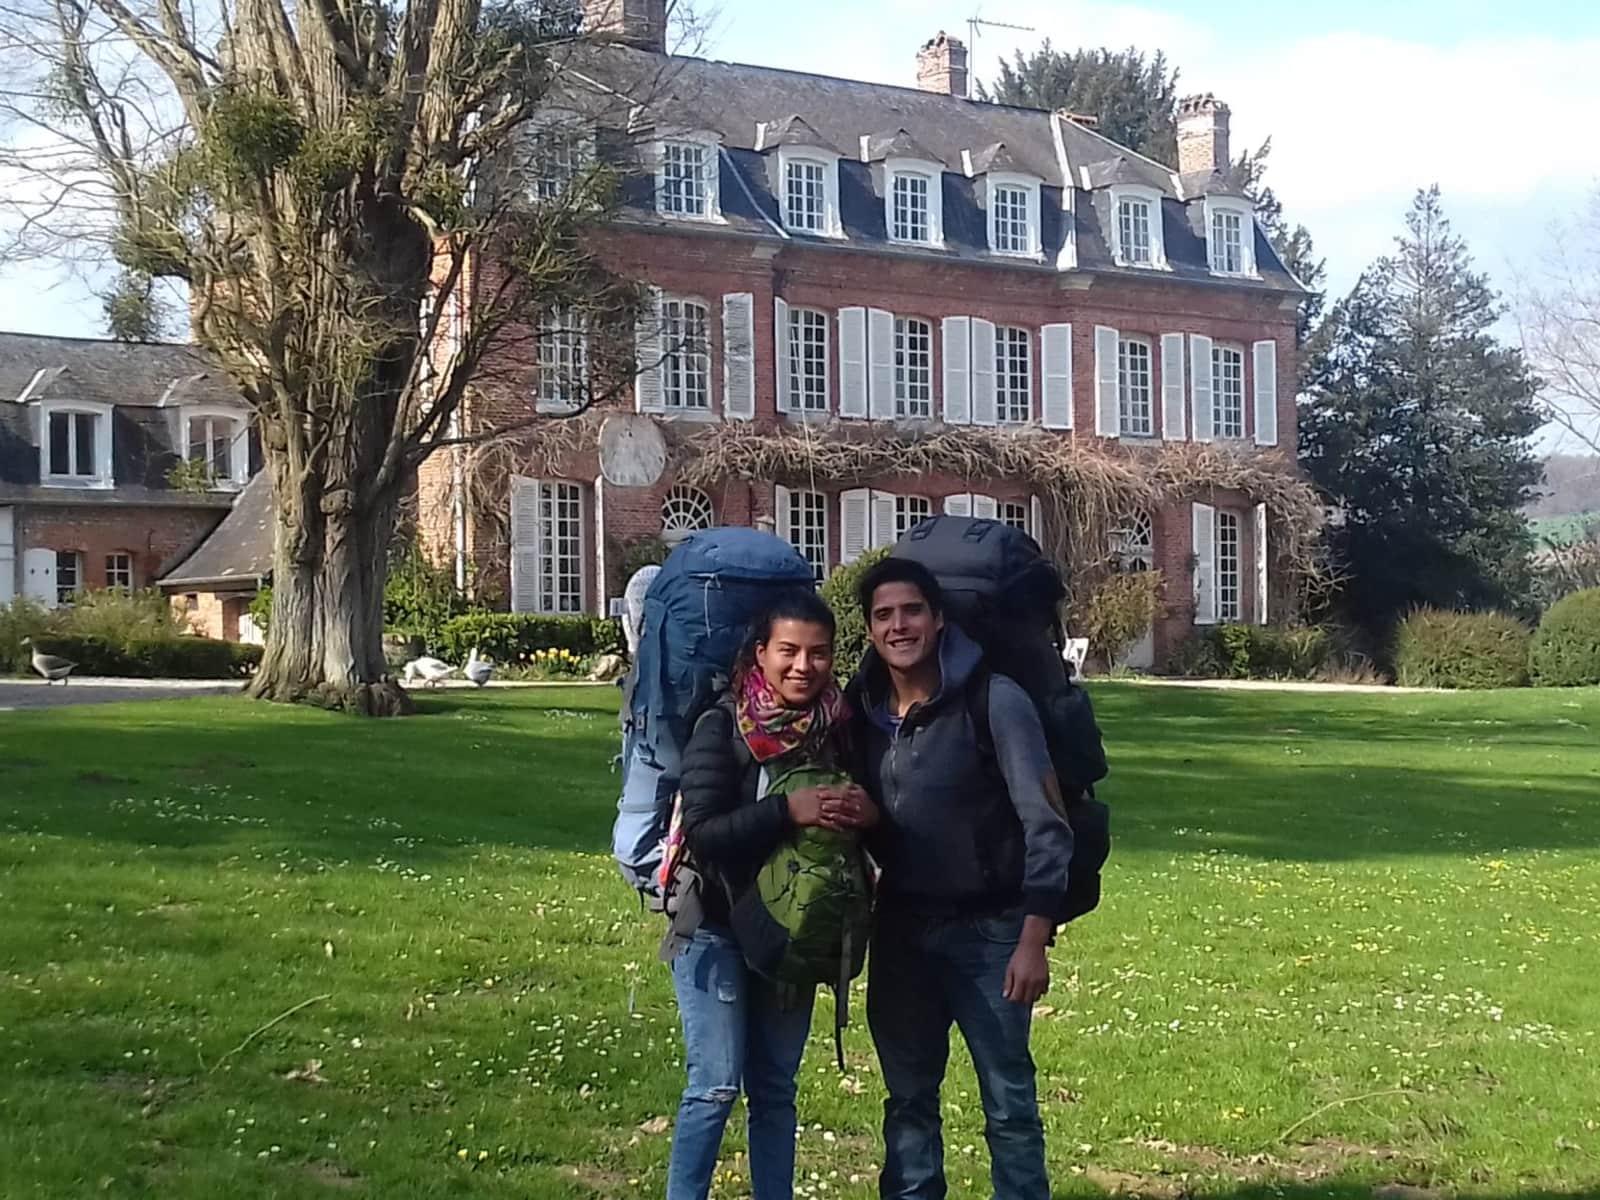 Yarett & Alvaro from Courchevel, France